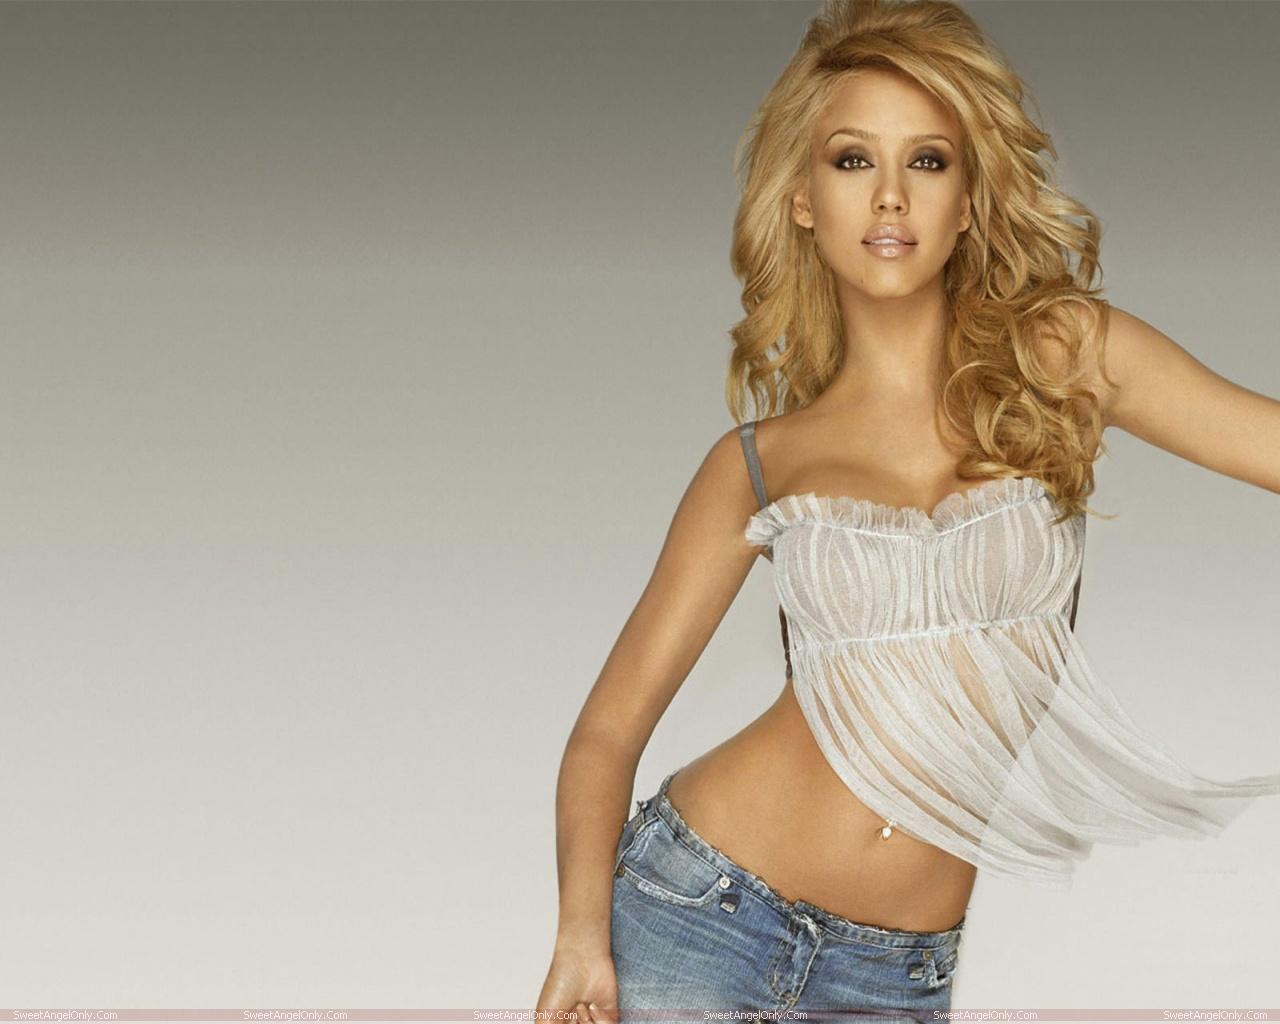 http://1.bp.blogspot.com/-Lg6aM5l3su0/TW5EsNIoNwI/AAAAAAAAE4Y/q5sifSNfnks/s1600/celebrity_jessica_alba_hot_photo_shoot_in_bikini_sweetangelonly_10.jpg